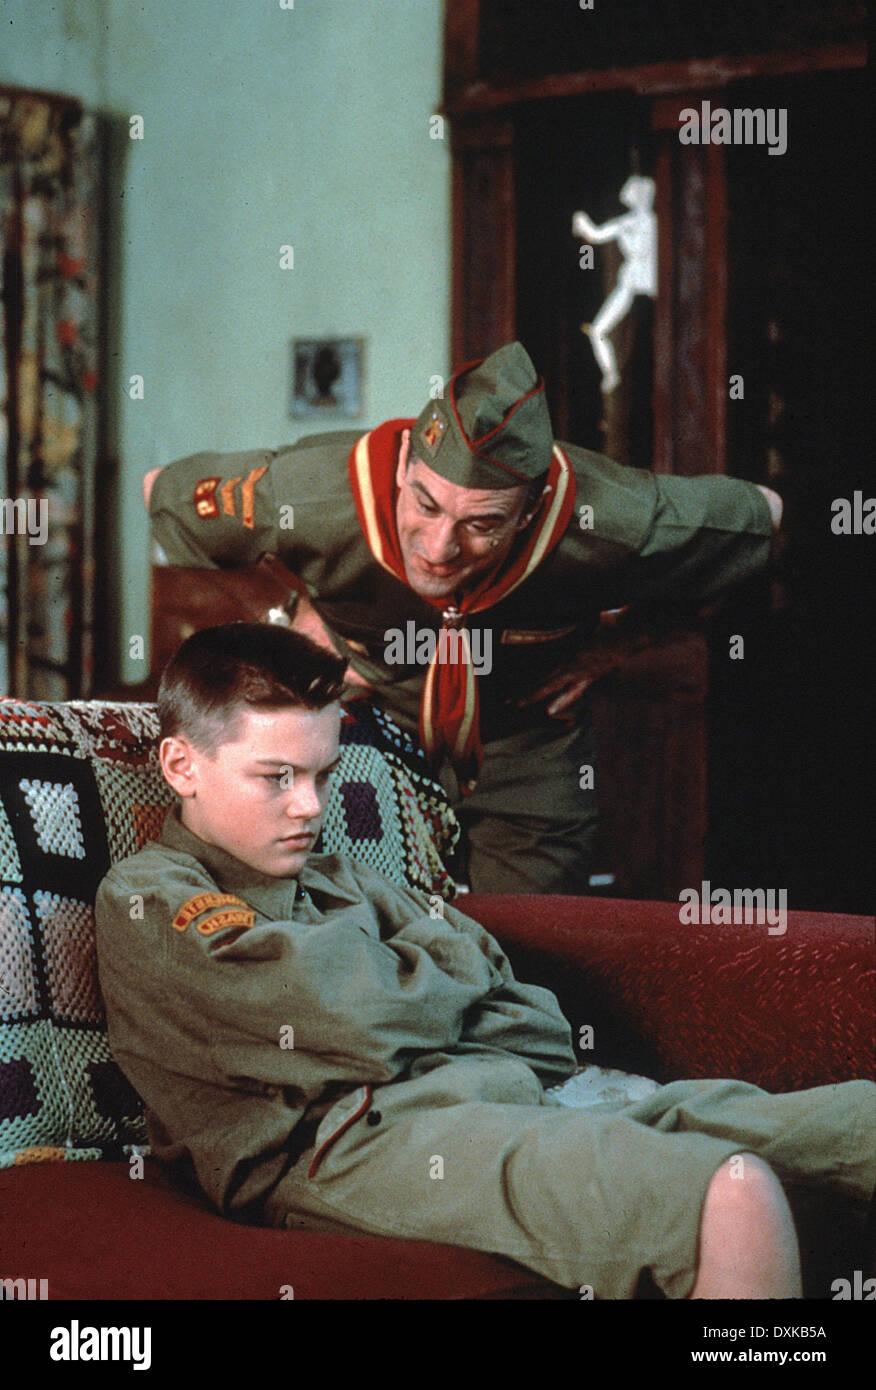 THIS BOY'S LIFE (US1993) LEONARDO DICAPRIO, ROBERT DE NIRO - Stock Image